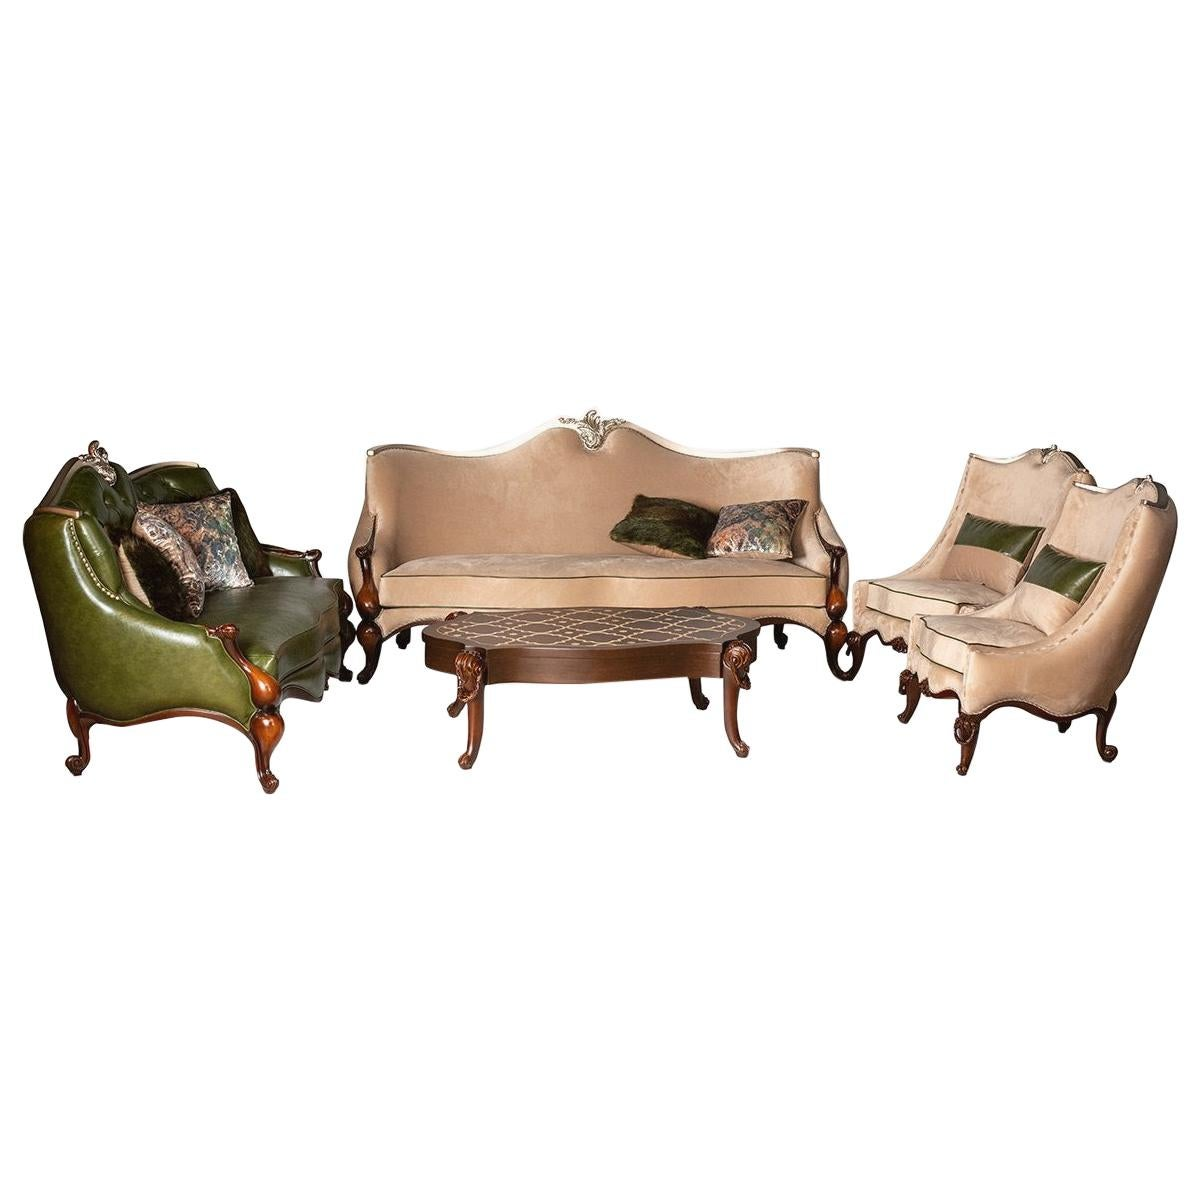 Neo-Classic Living Room (5 PIECES), 20th Century